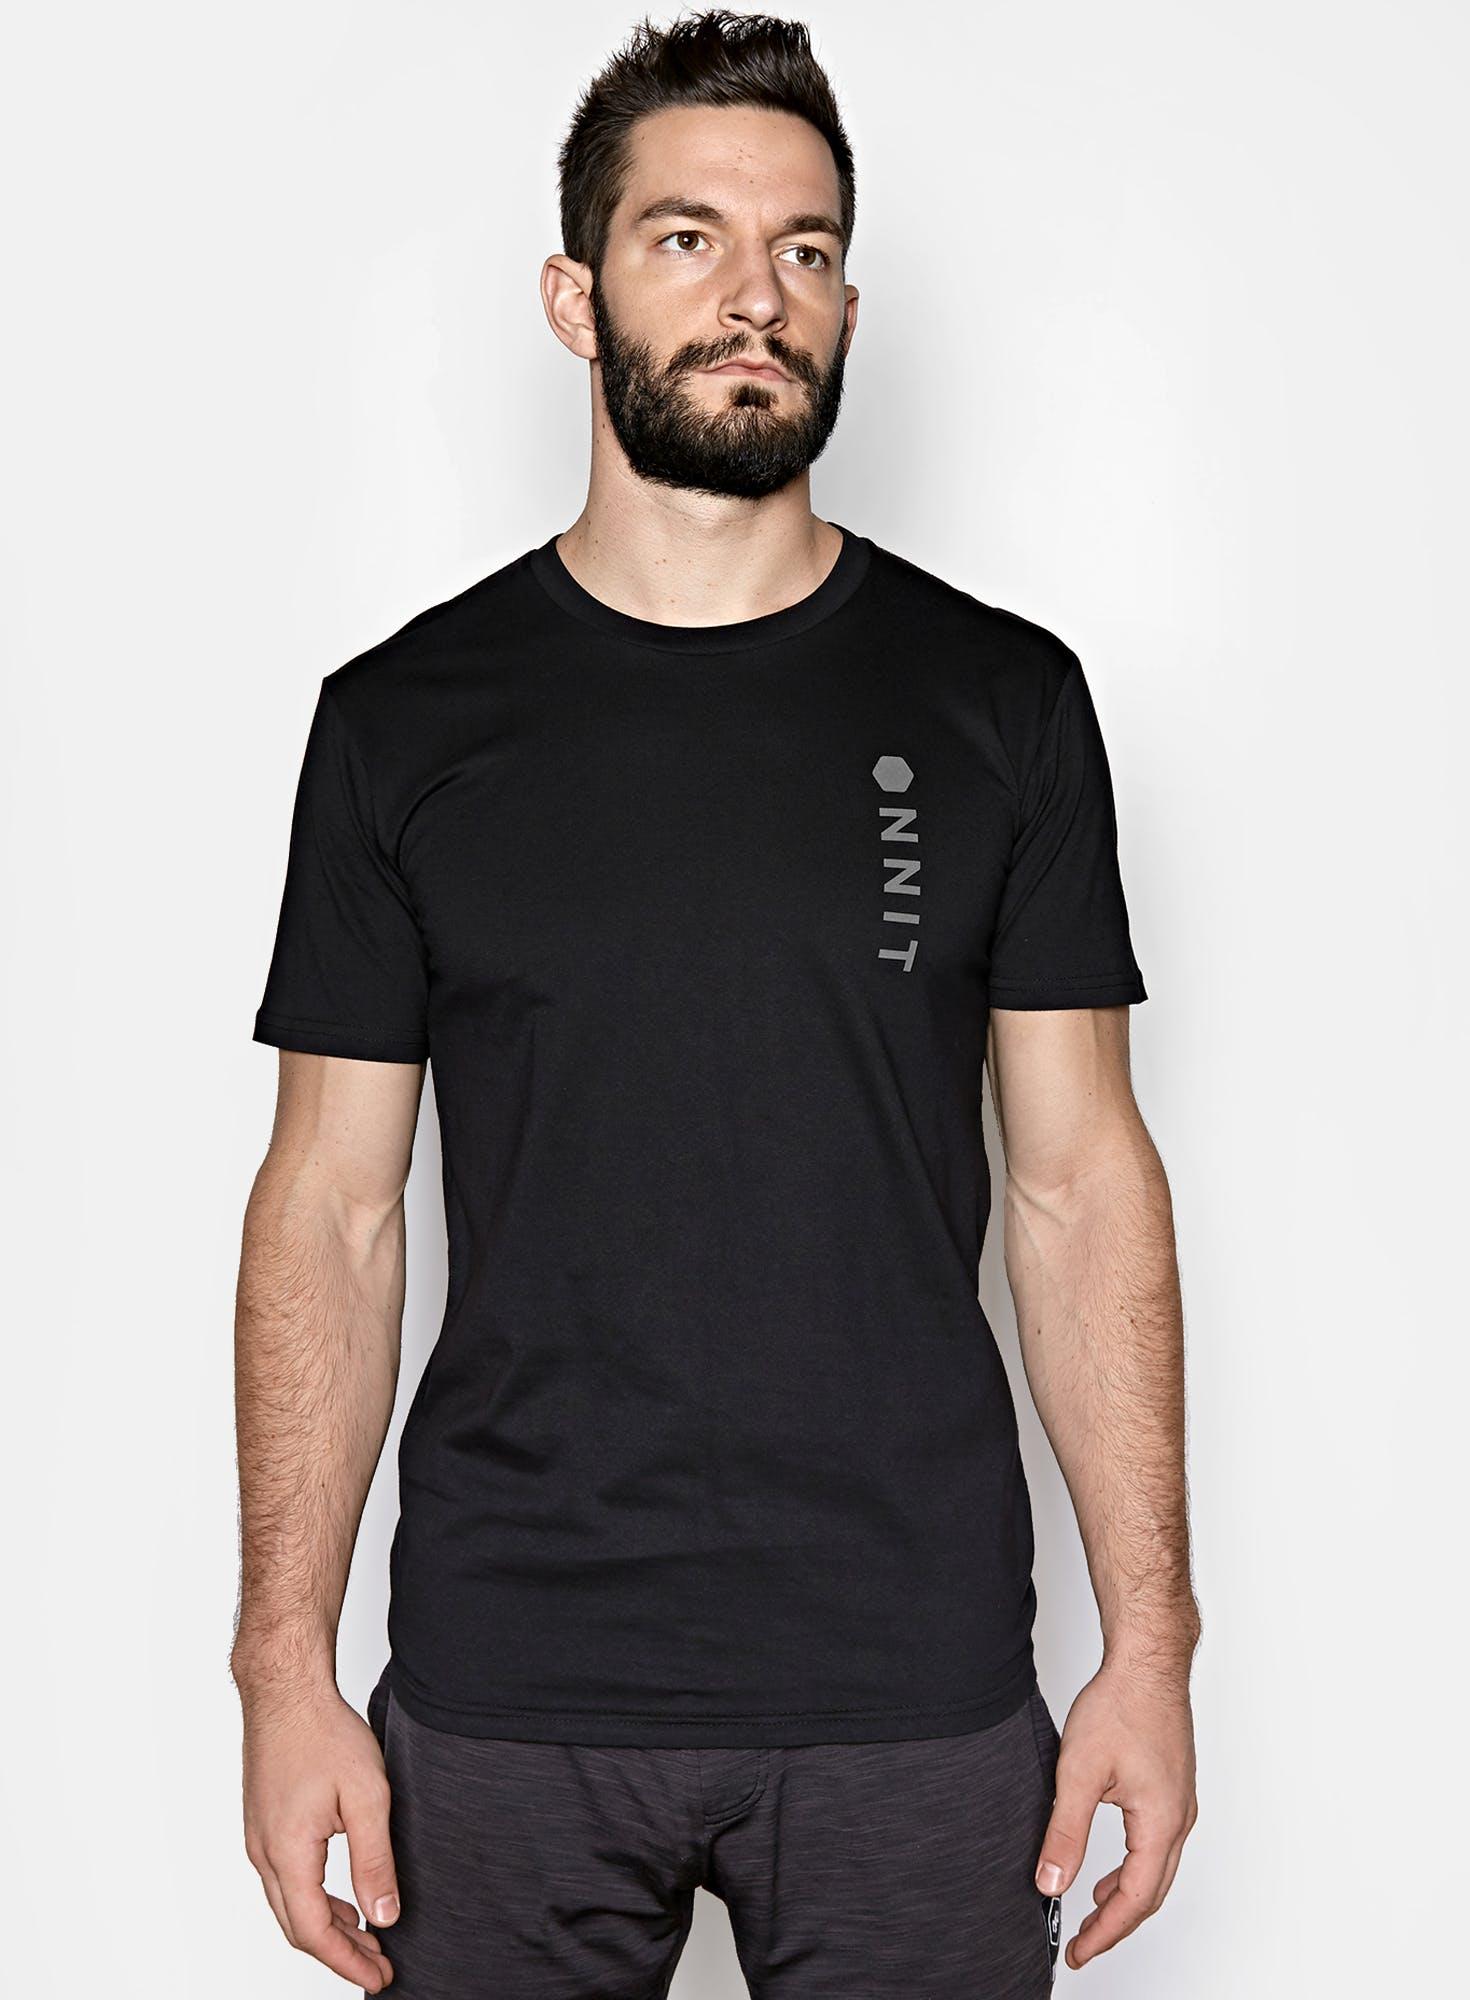 Hardware Vert T-Shirt